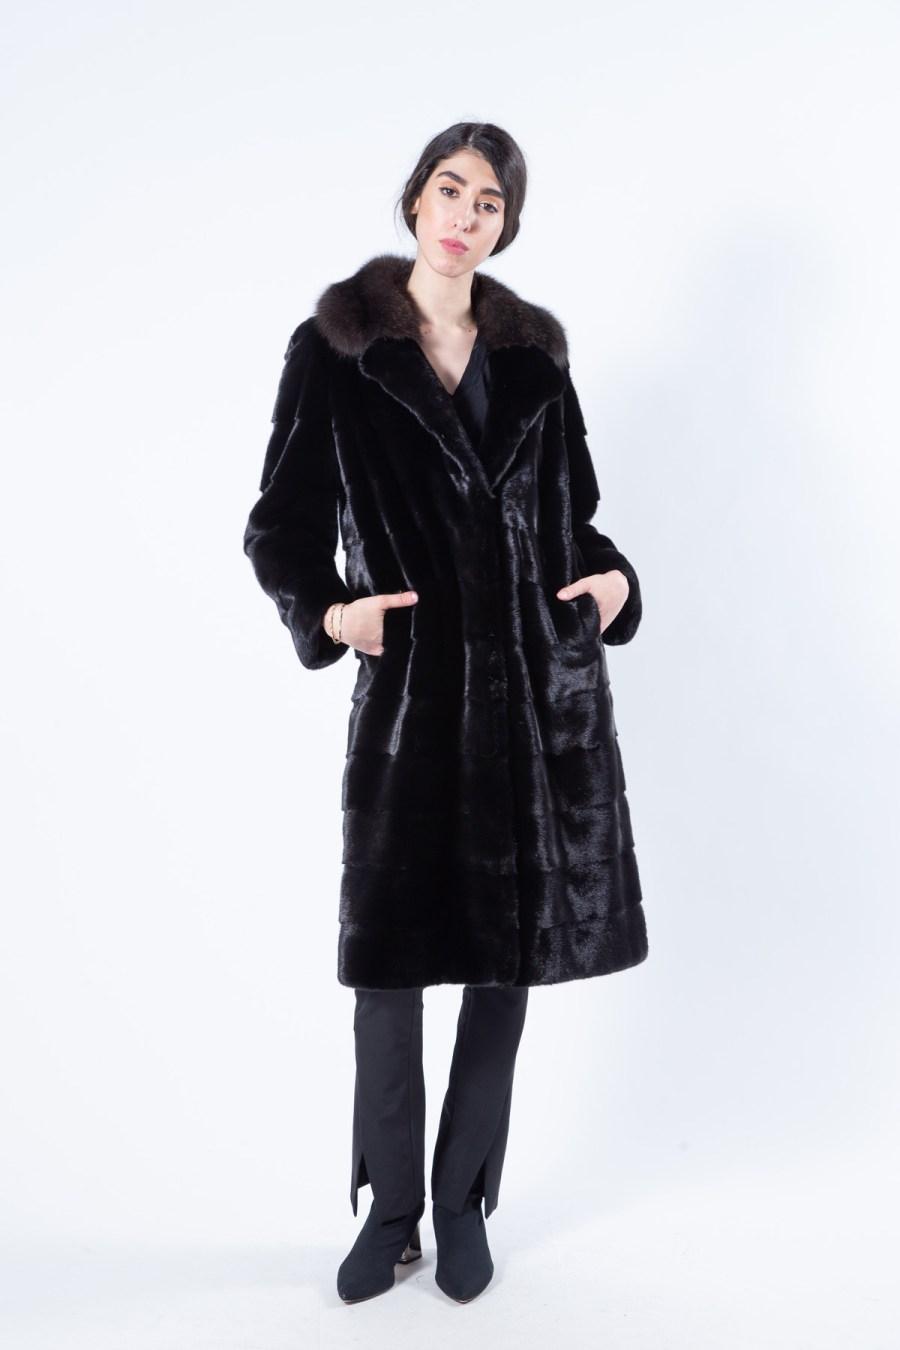 Blackglama Mink Coat with Sable collar | Sarigianni Furs